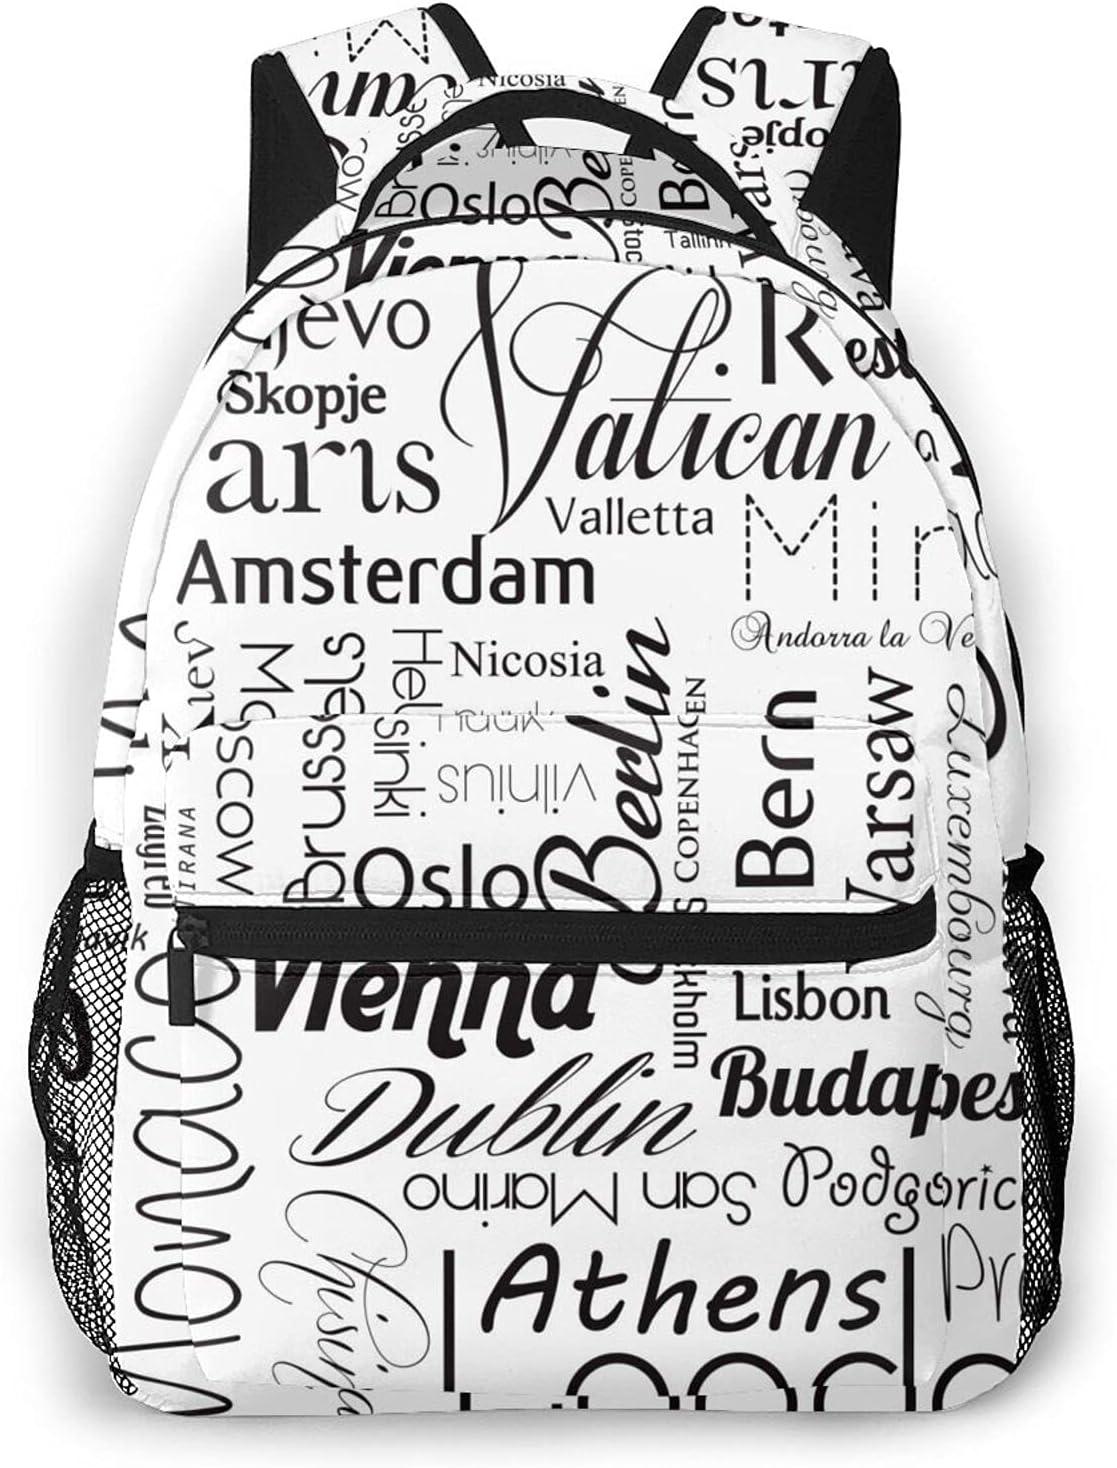 Rare Font Las Vegas Mall Letter Unique Outdoor Shoulders Fabric Backpack Multipu Bag